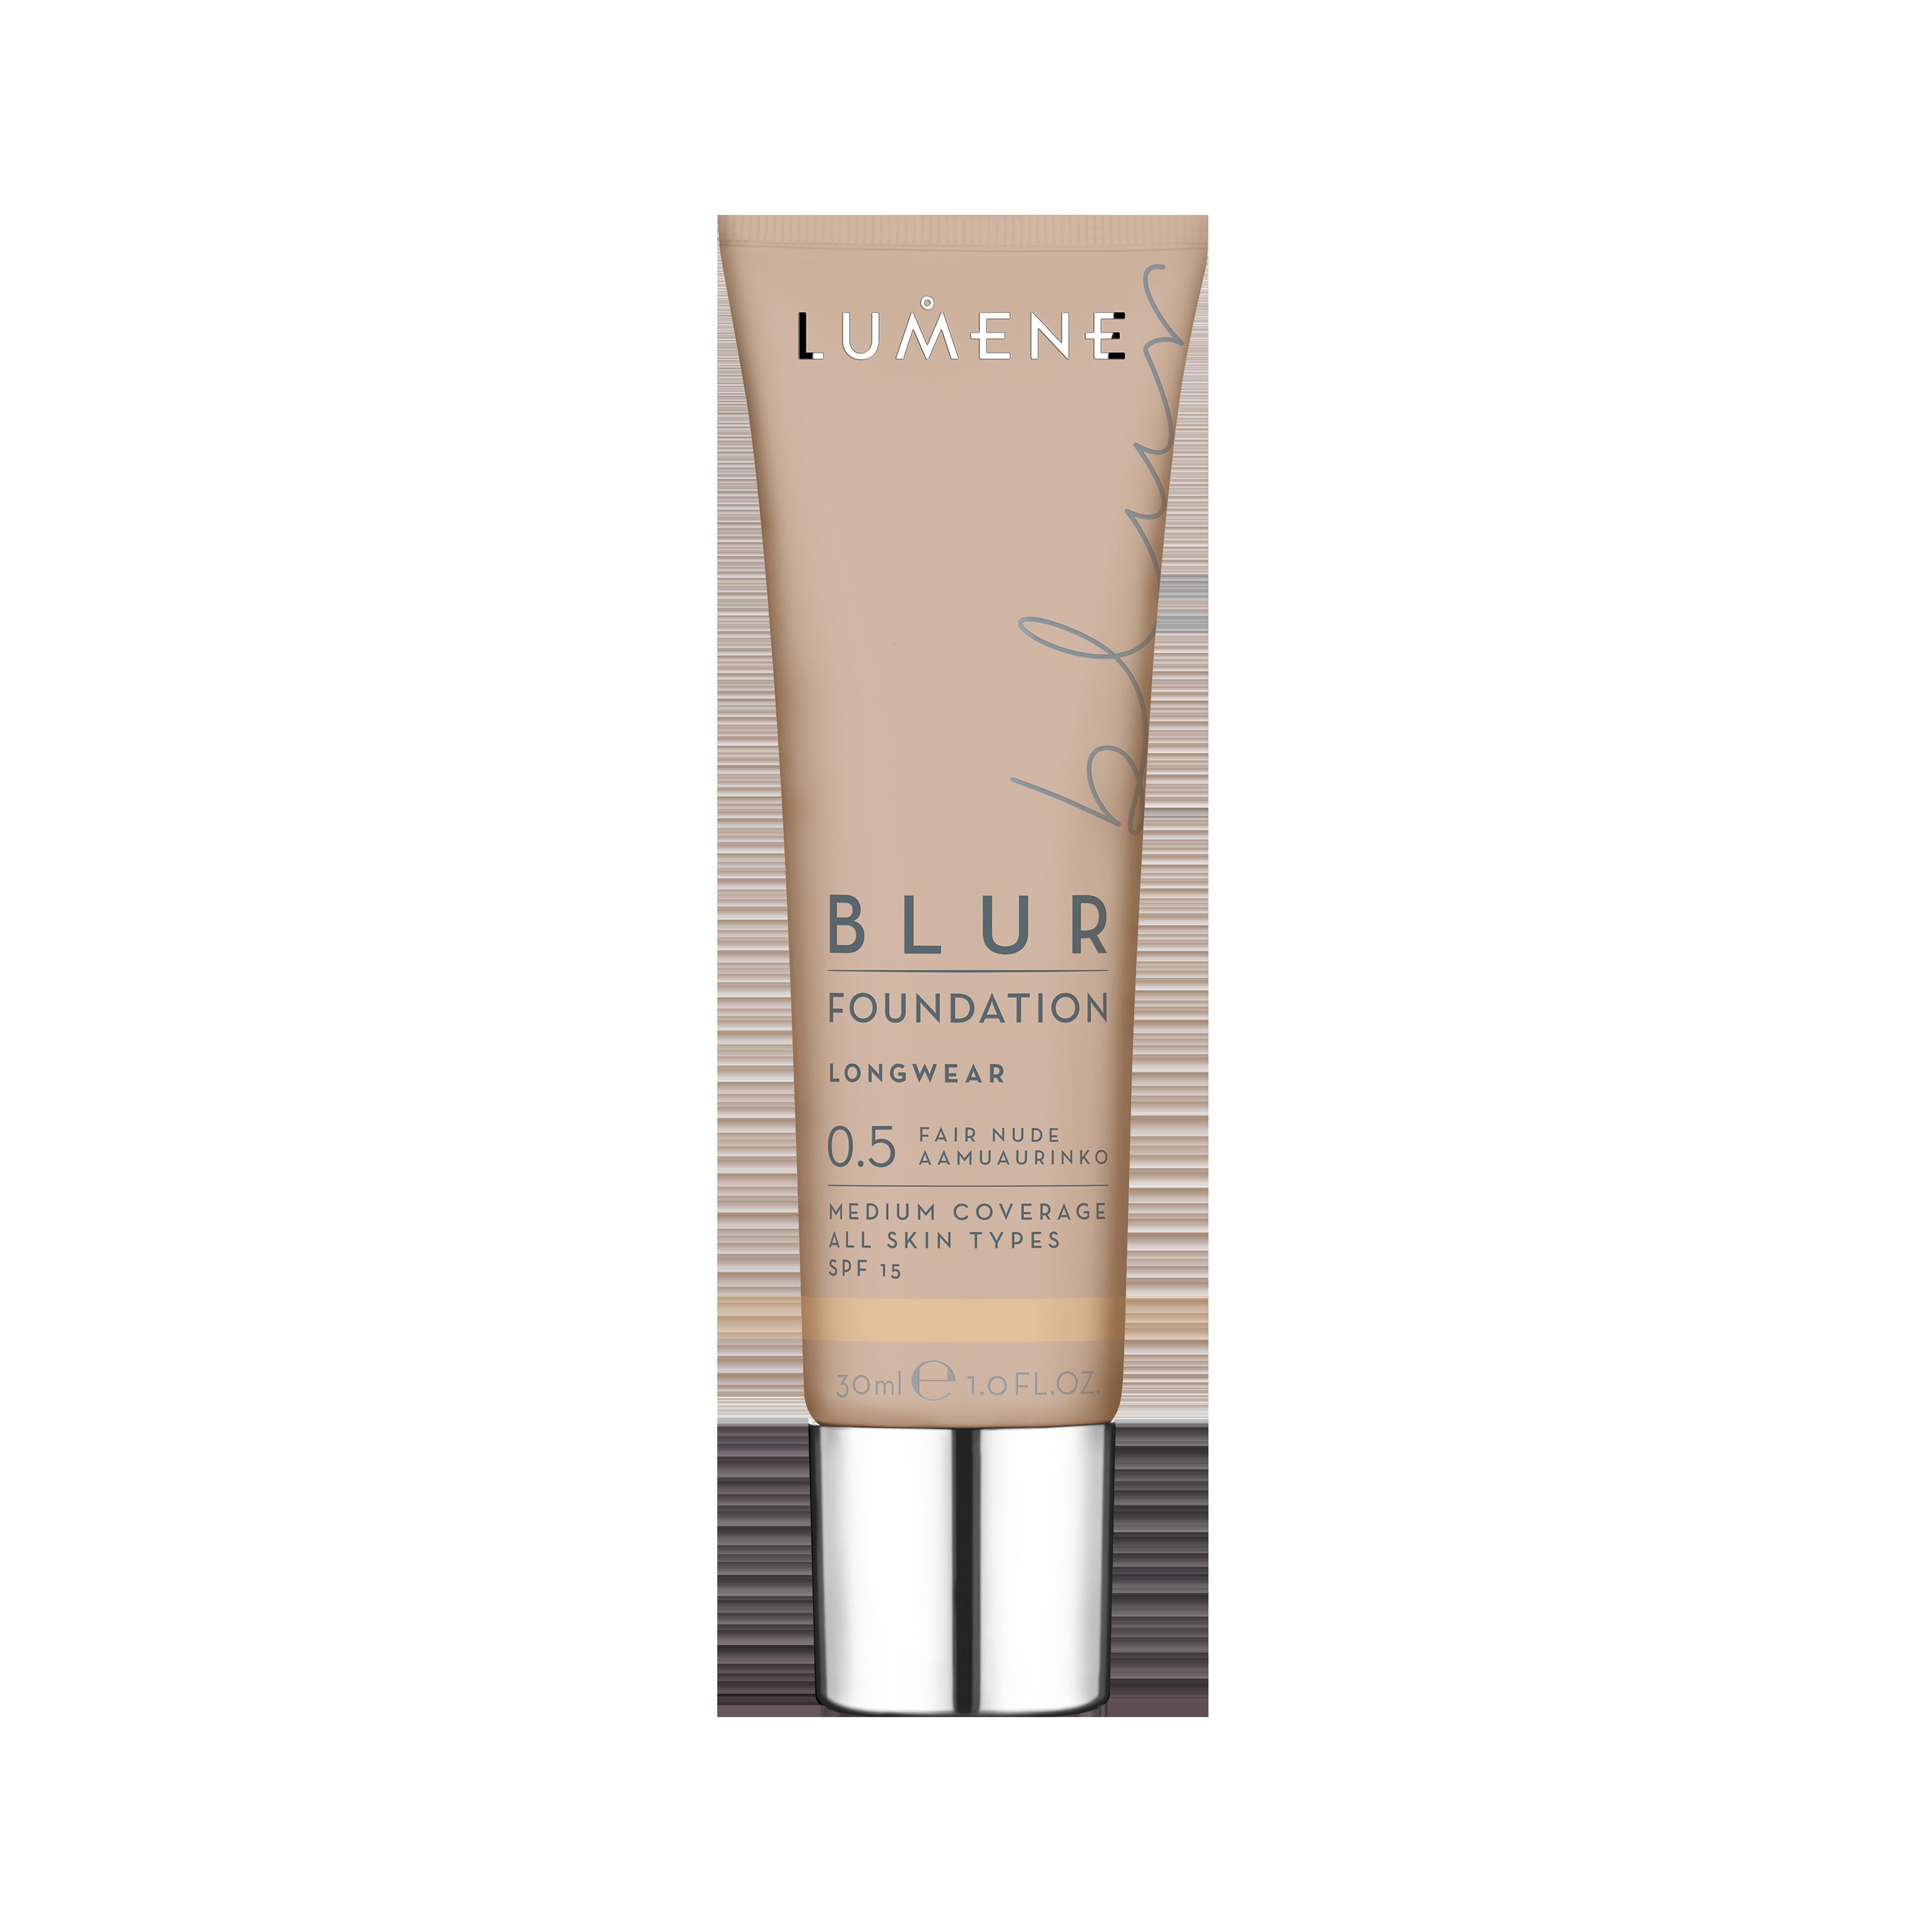 Blur Foundation 0.5 Fair Nude